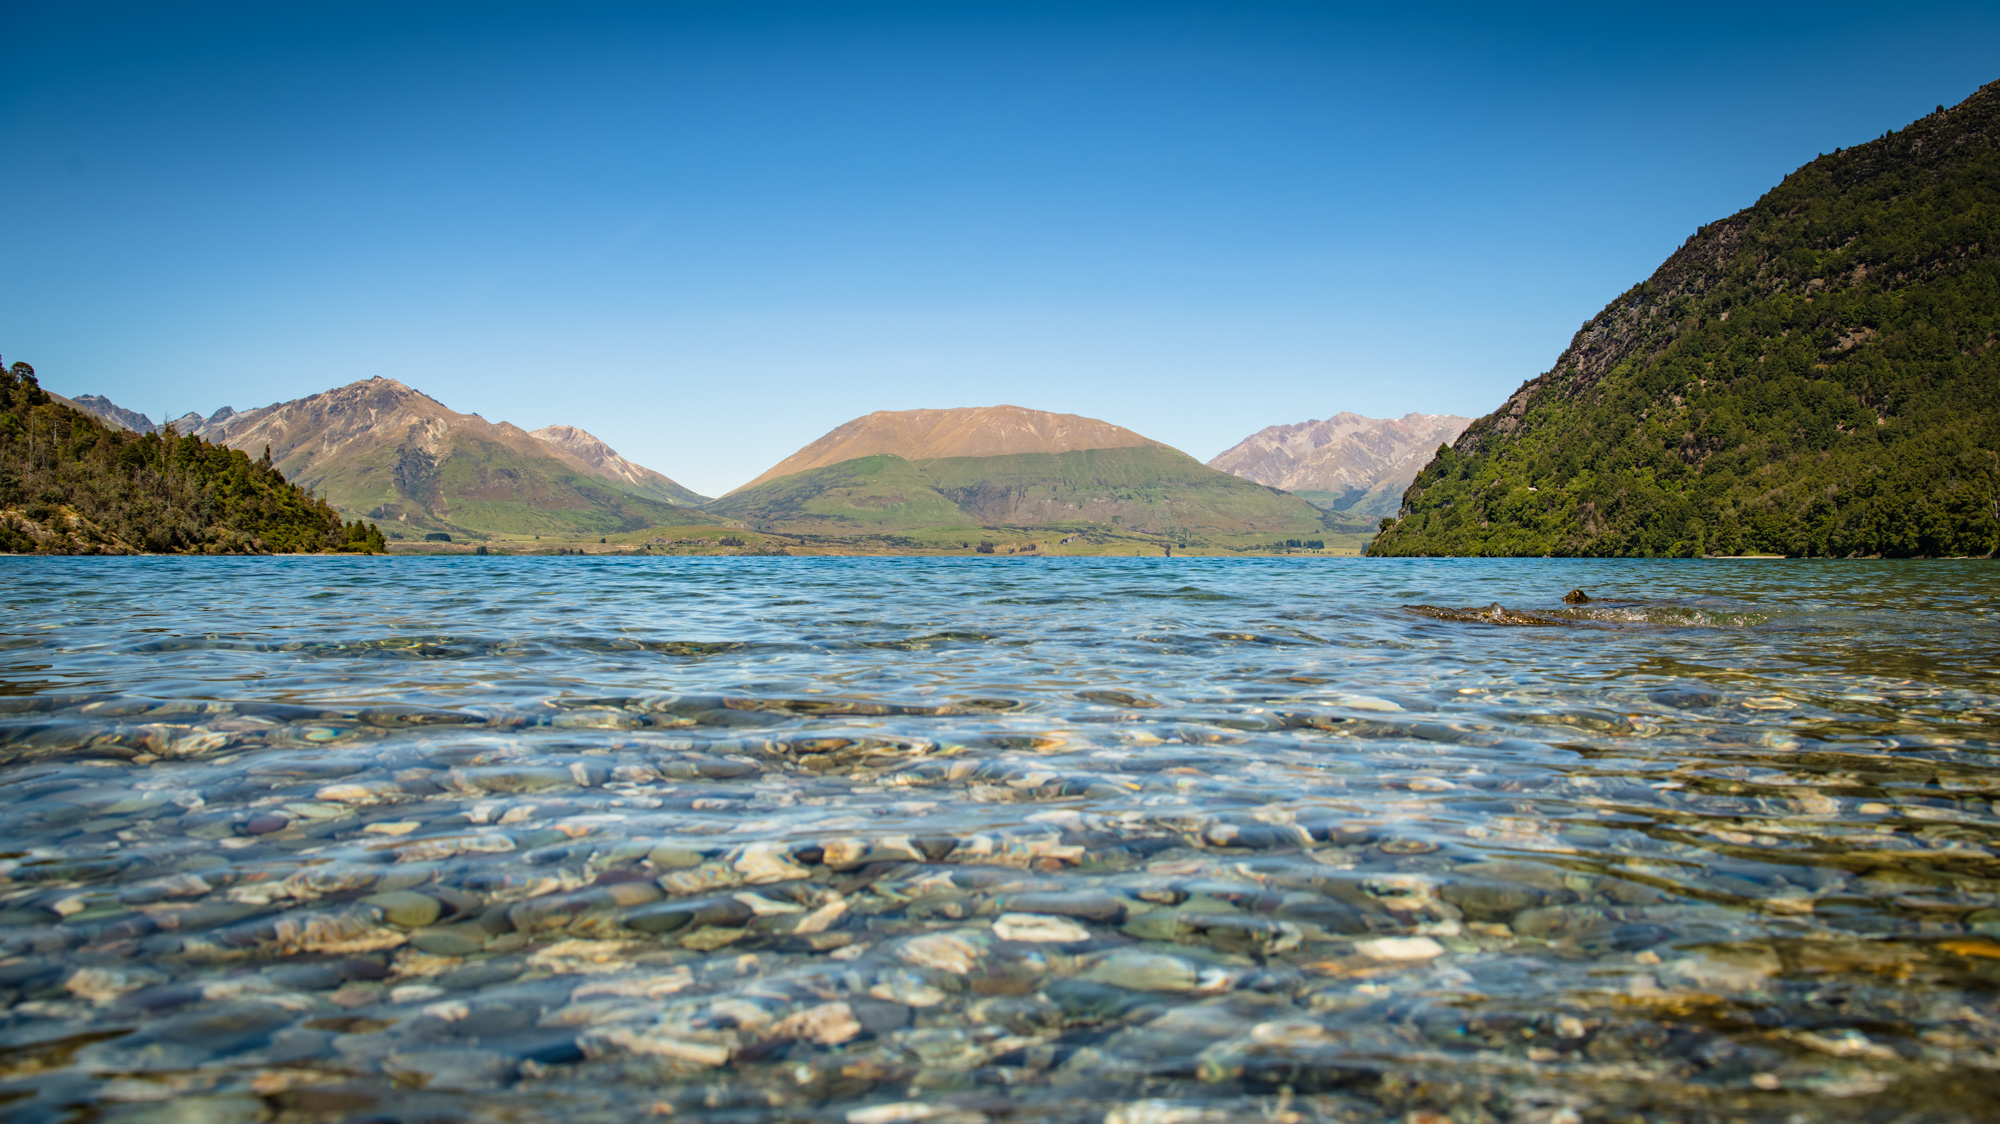 Bobs Cove - Walk through the Native Bush to access this 100% Pure NZ location